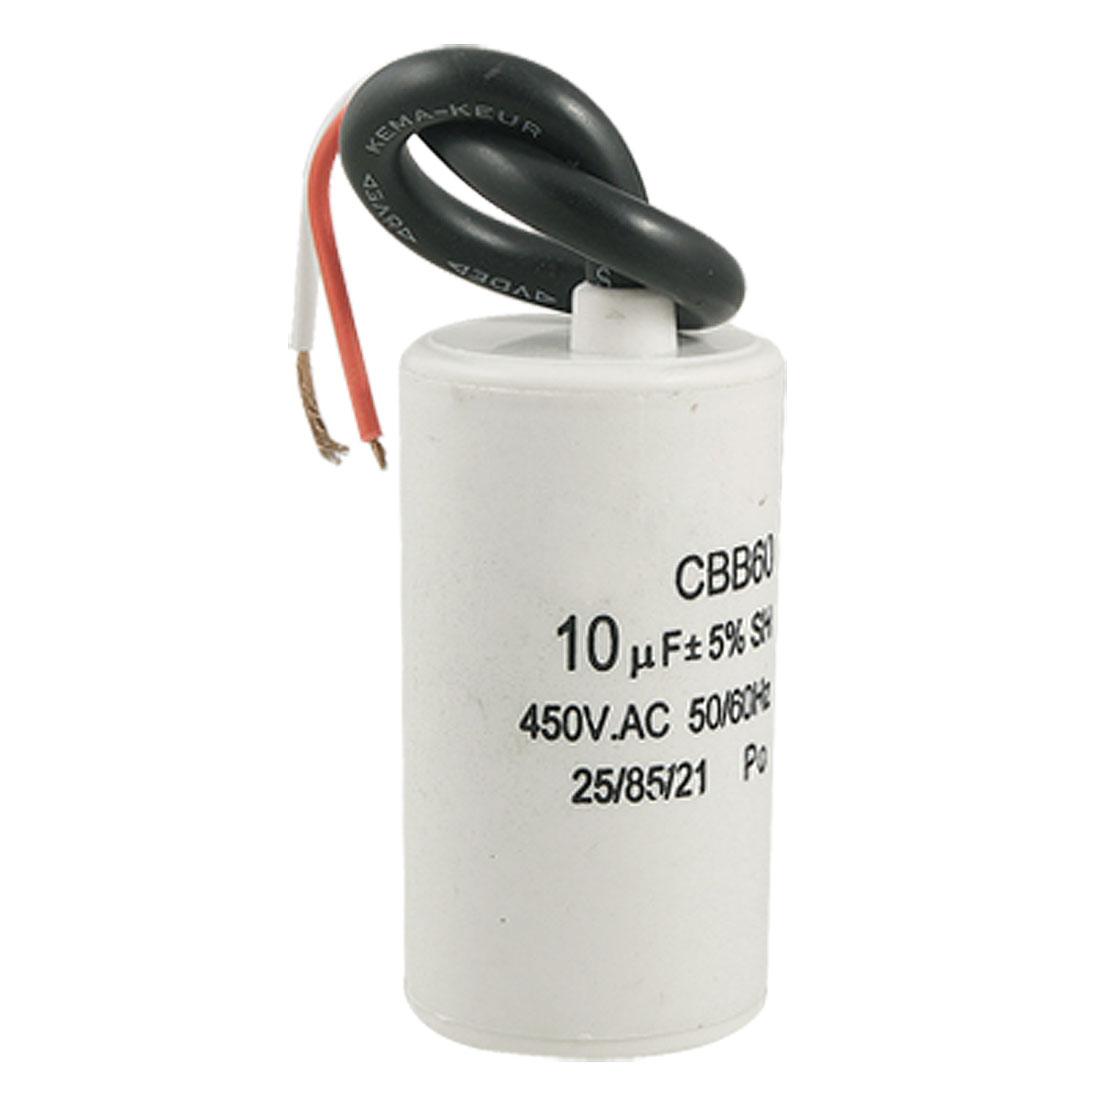 CBB60 10uF Wire Lead Cylinder Motor Run SH Capacitor AC 450V